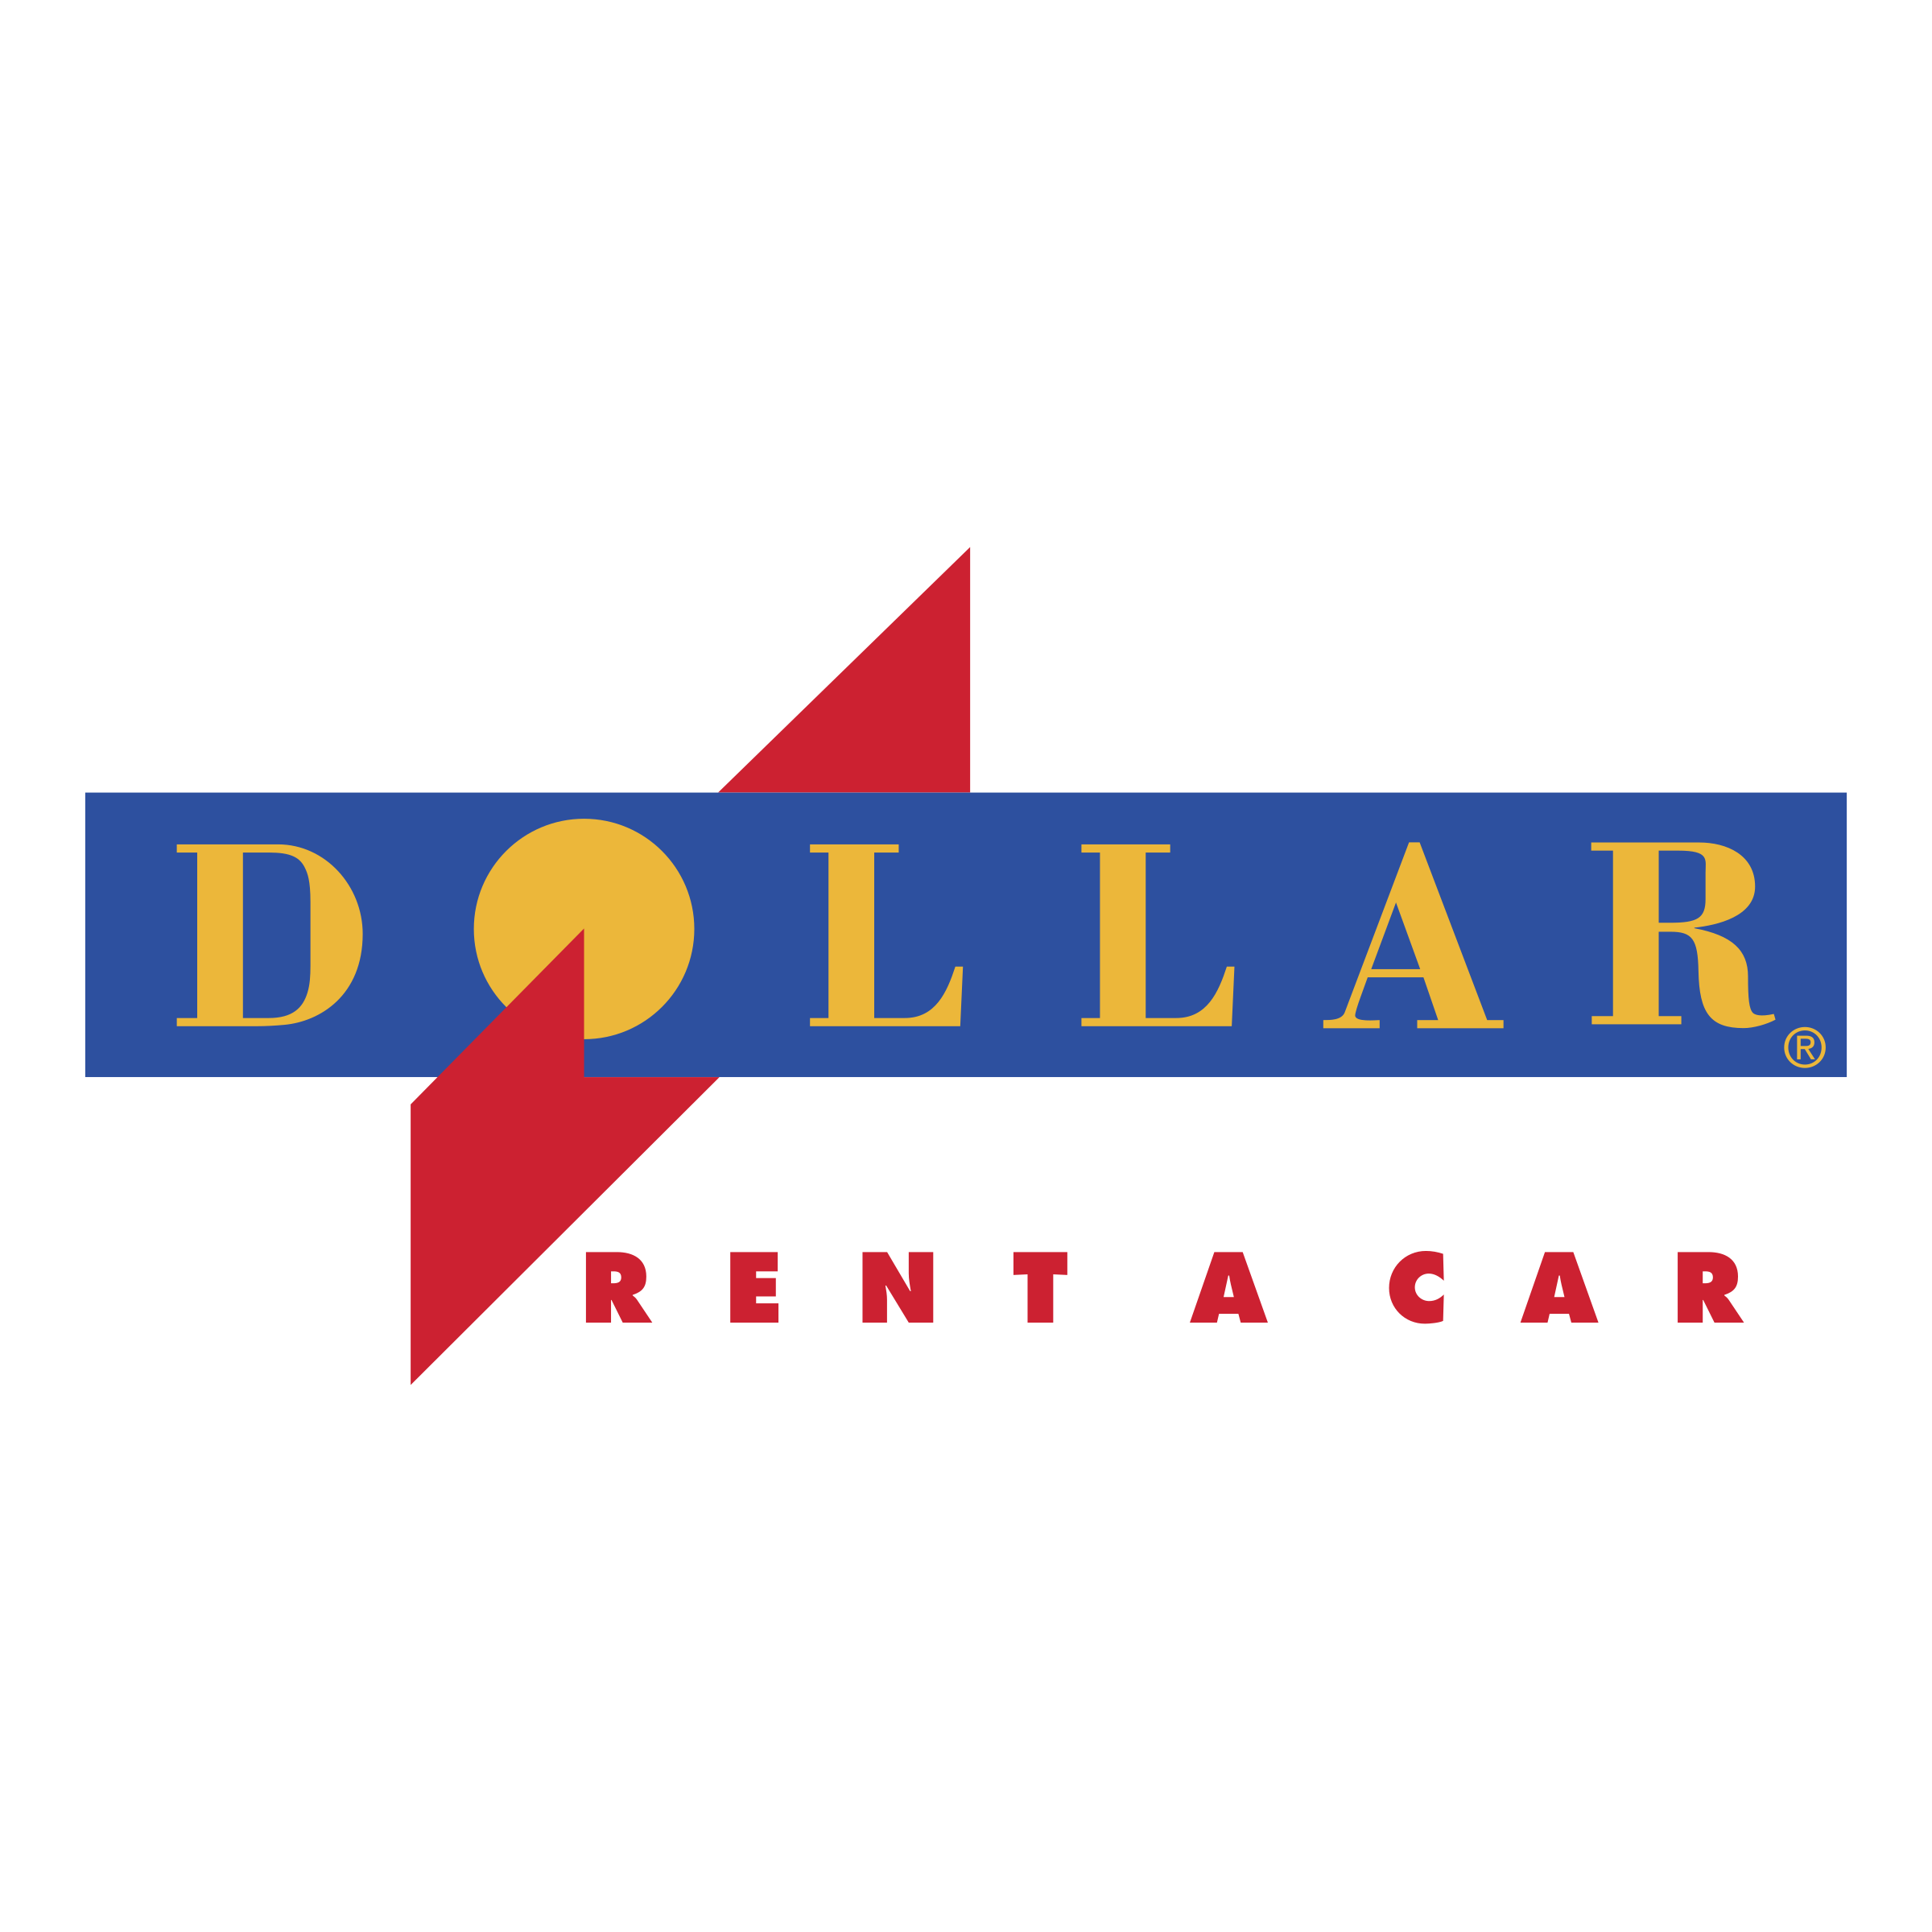 Dollar Rent A Car Logo PNG Transparent & SVG Vector.